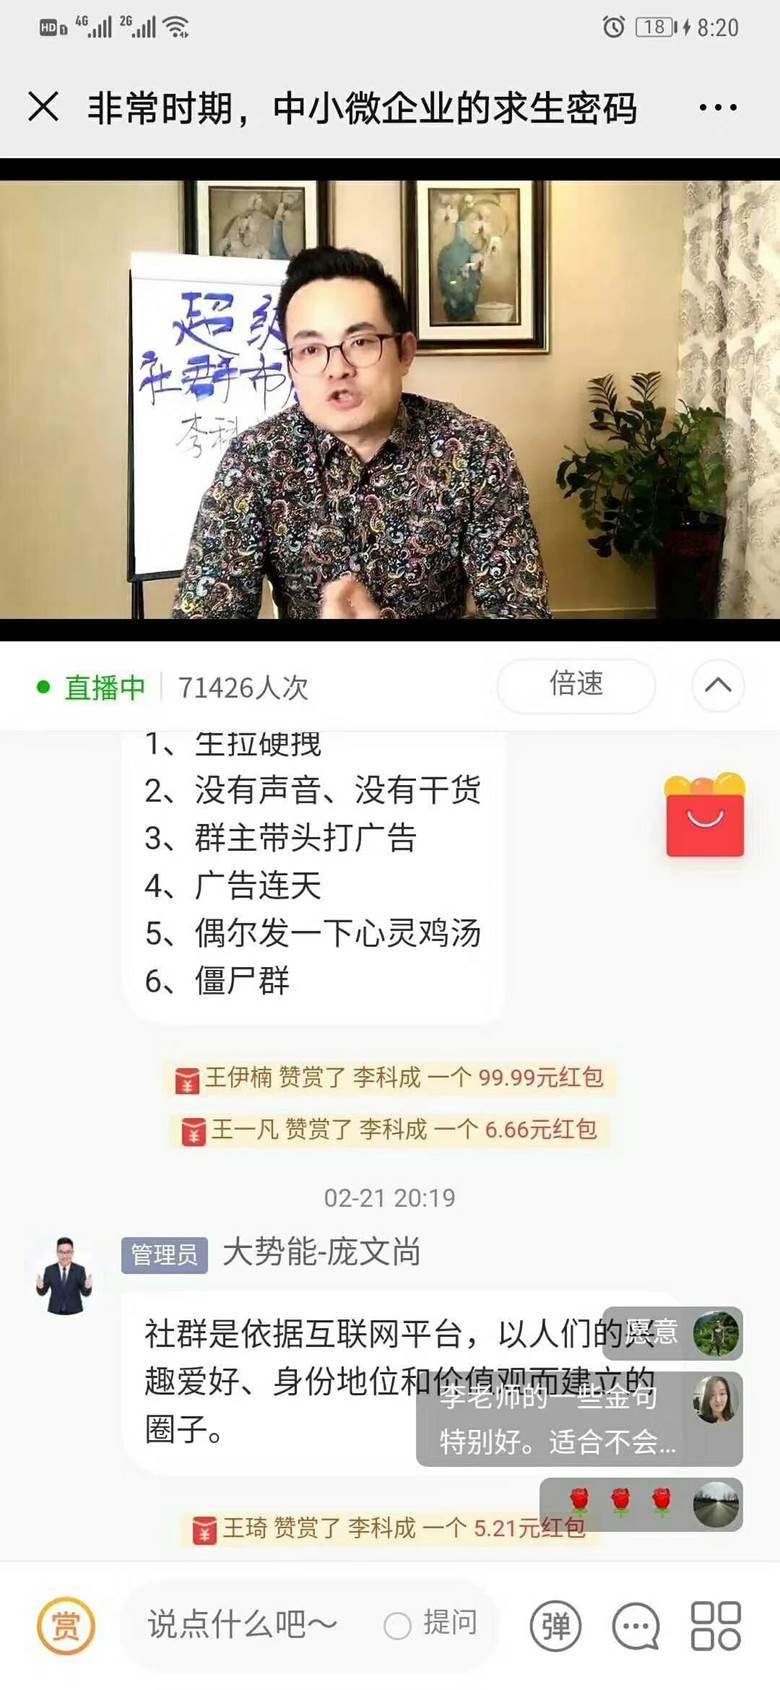 http://www.huodongxing.com/file/20180201/2862953425099/943709591133938.jpg